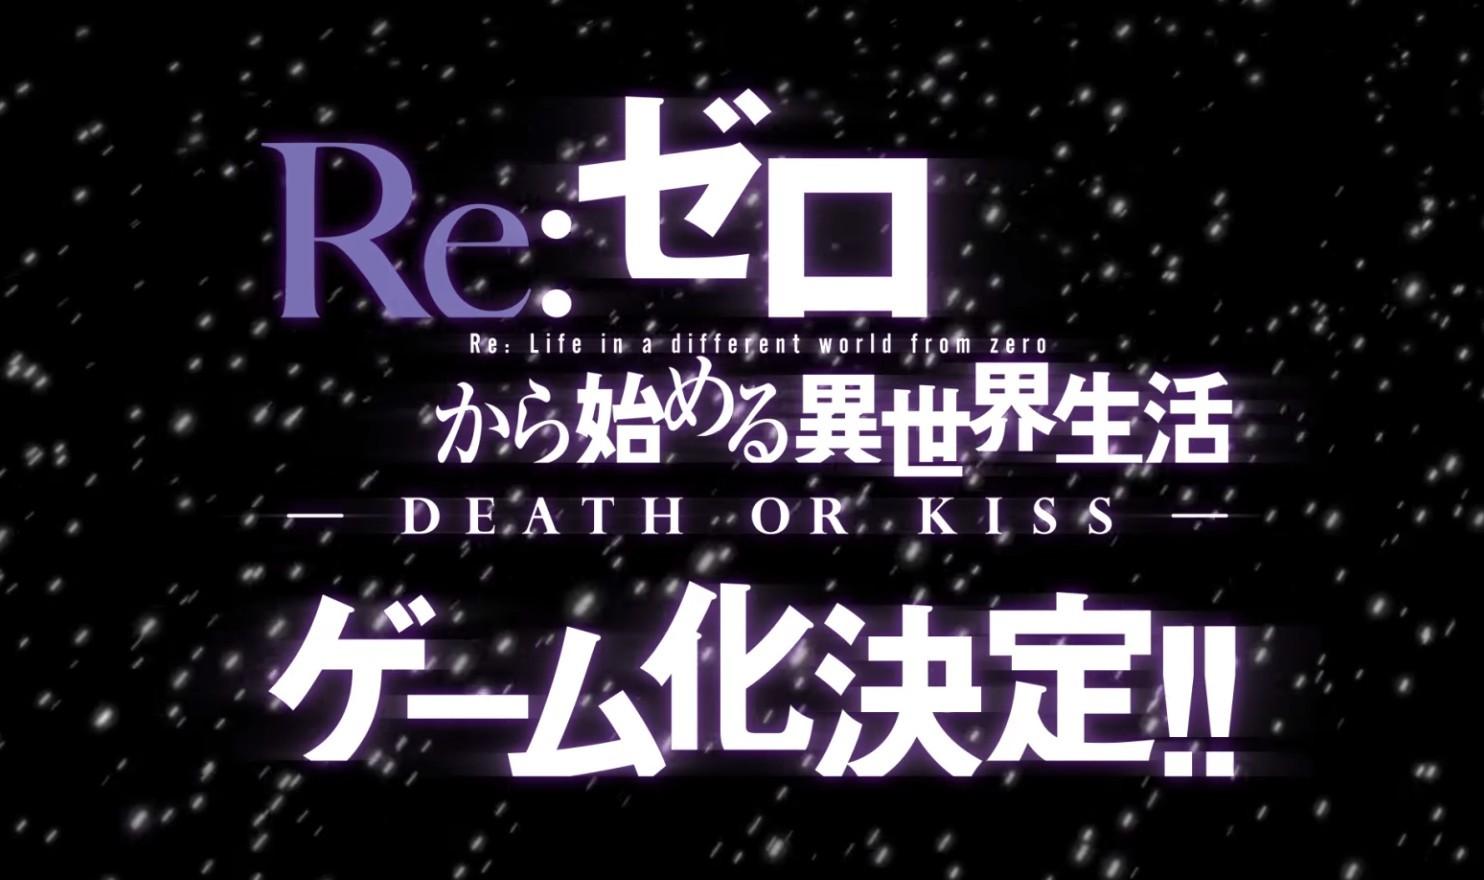 《Re:0》游戏化决定